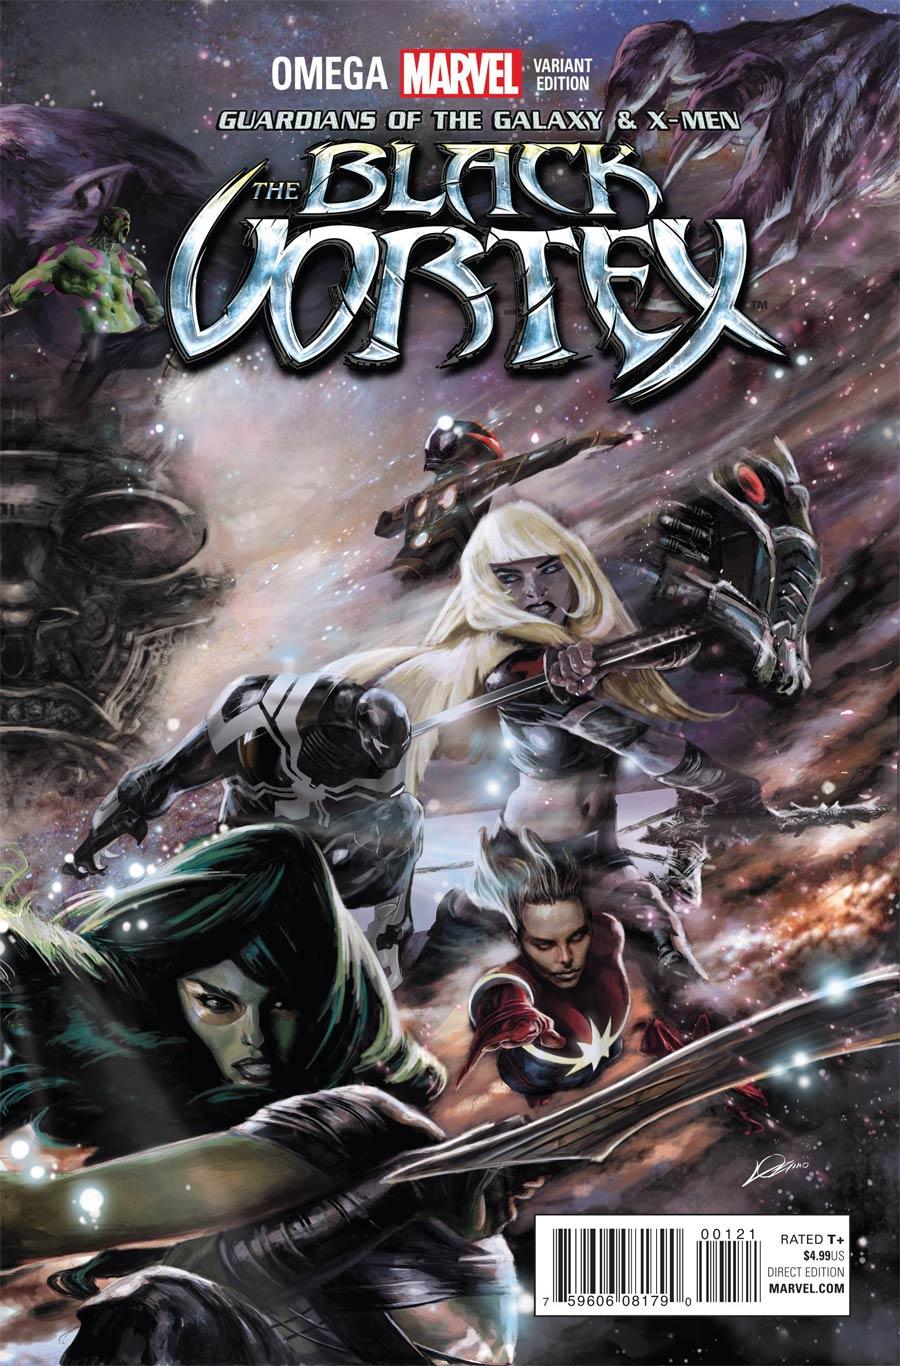 Guardians Of The Galaxy & X-Men Black Vortex Omega #1 Cover B Variant Alexander Lozano Connecting Cover (Black Vortex Part 13)